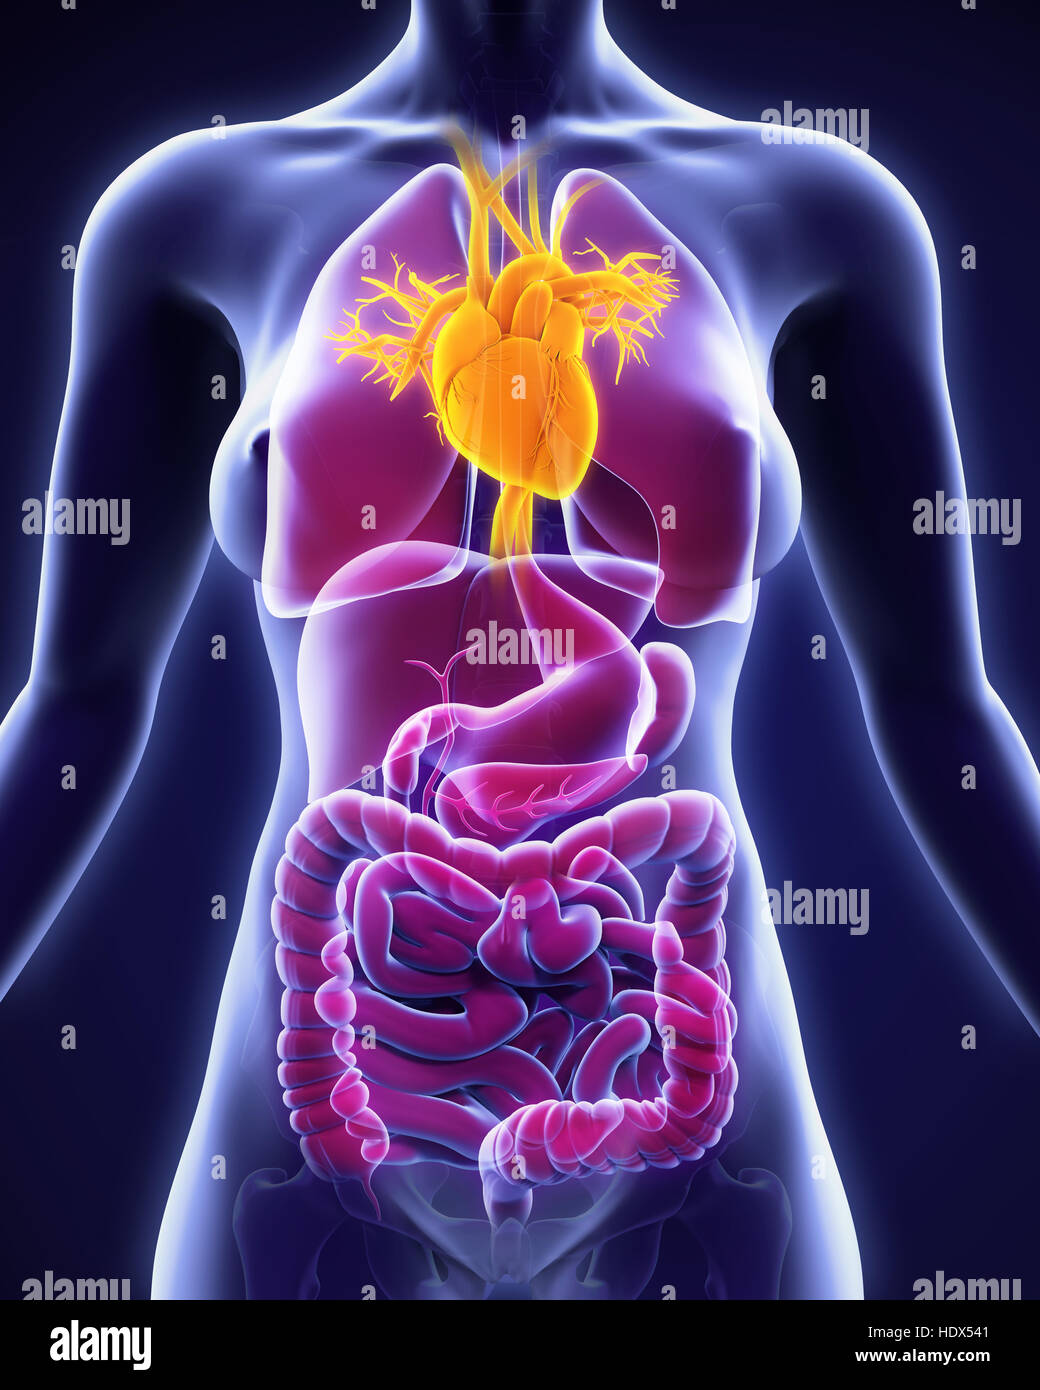 Female Cardiovascular System Stockfotos & Female Cardiovascular ...